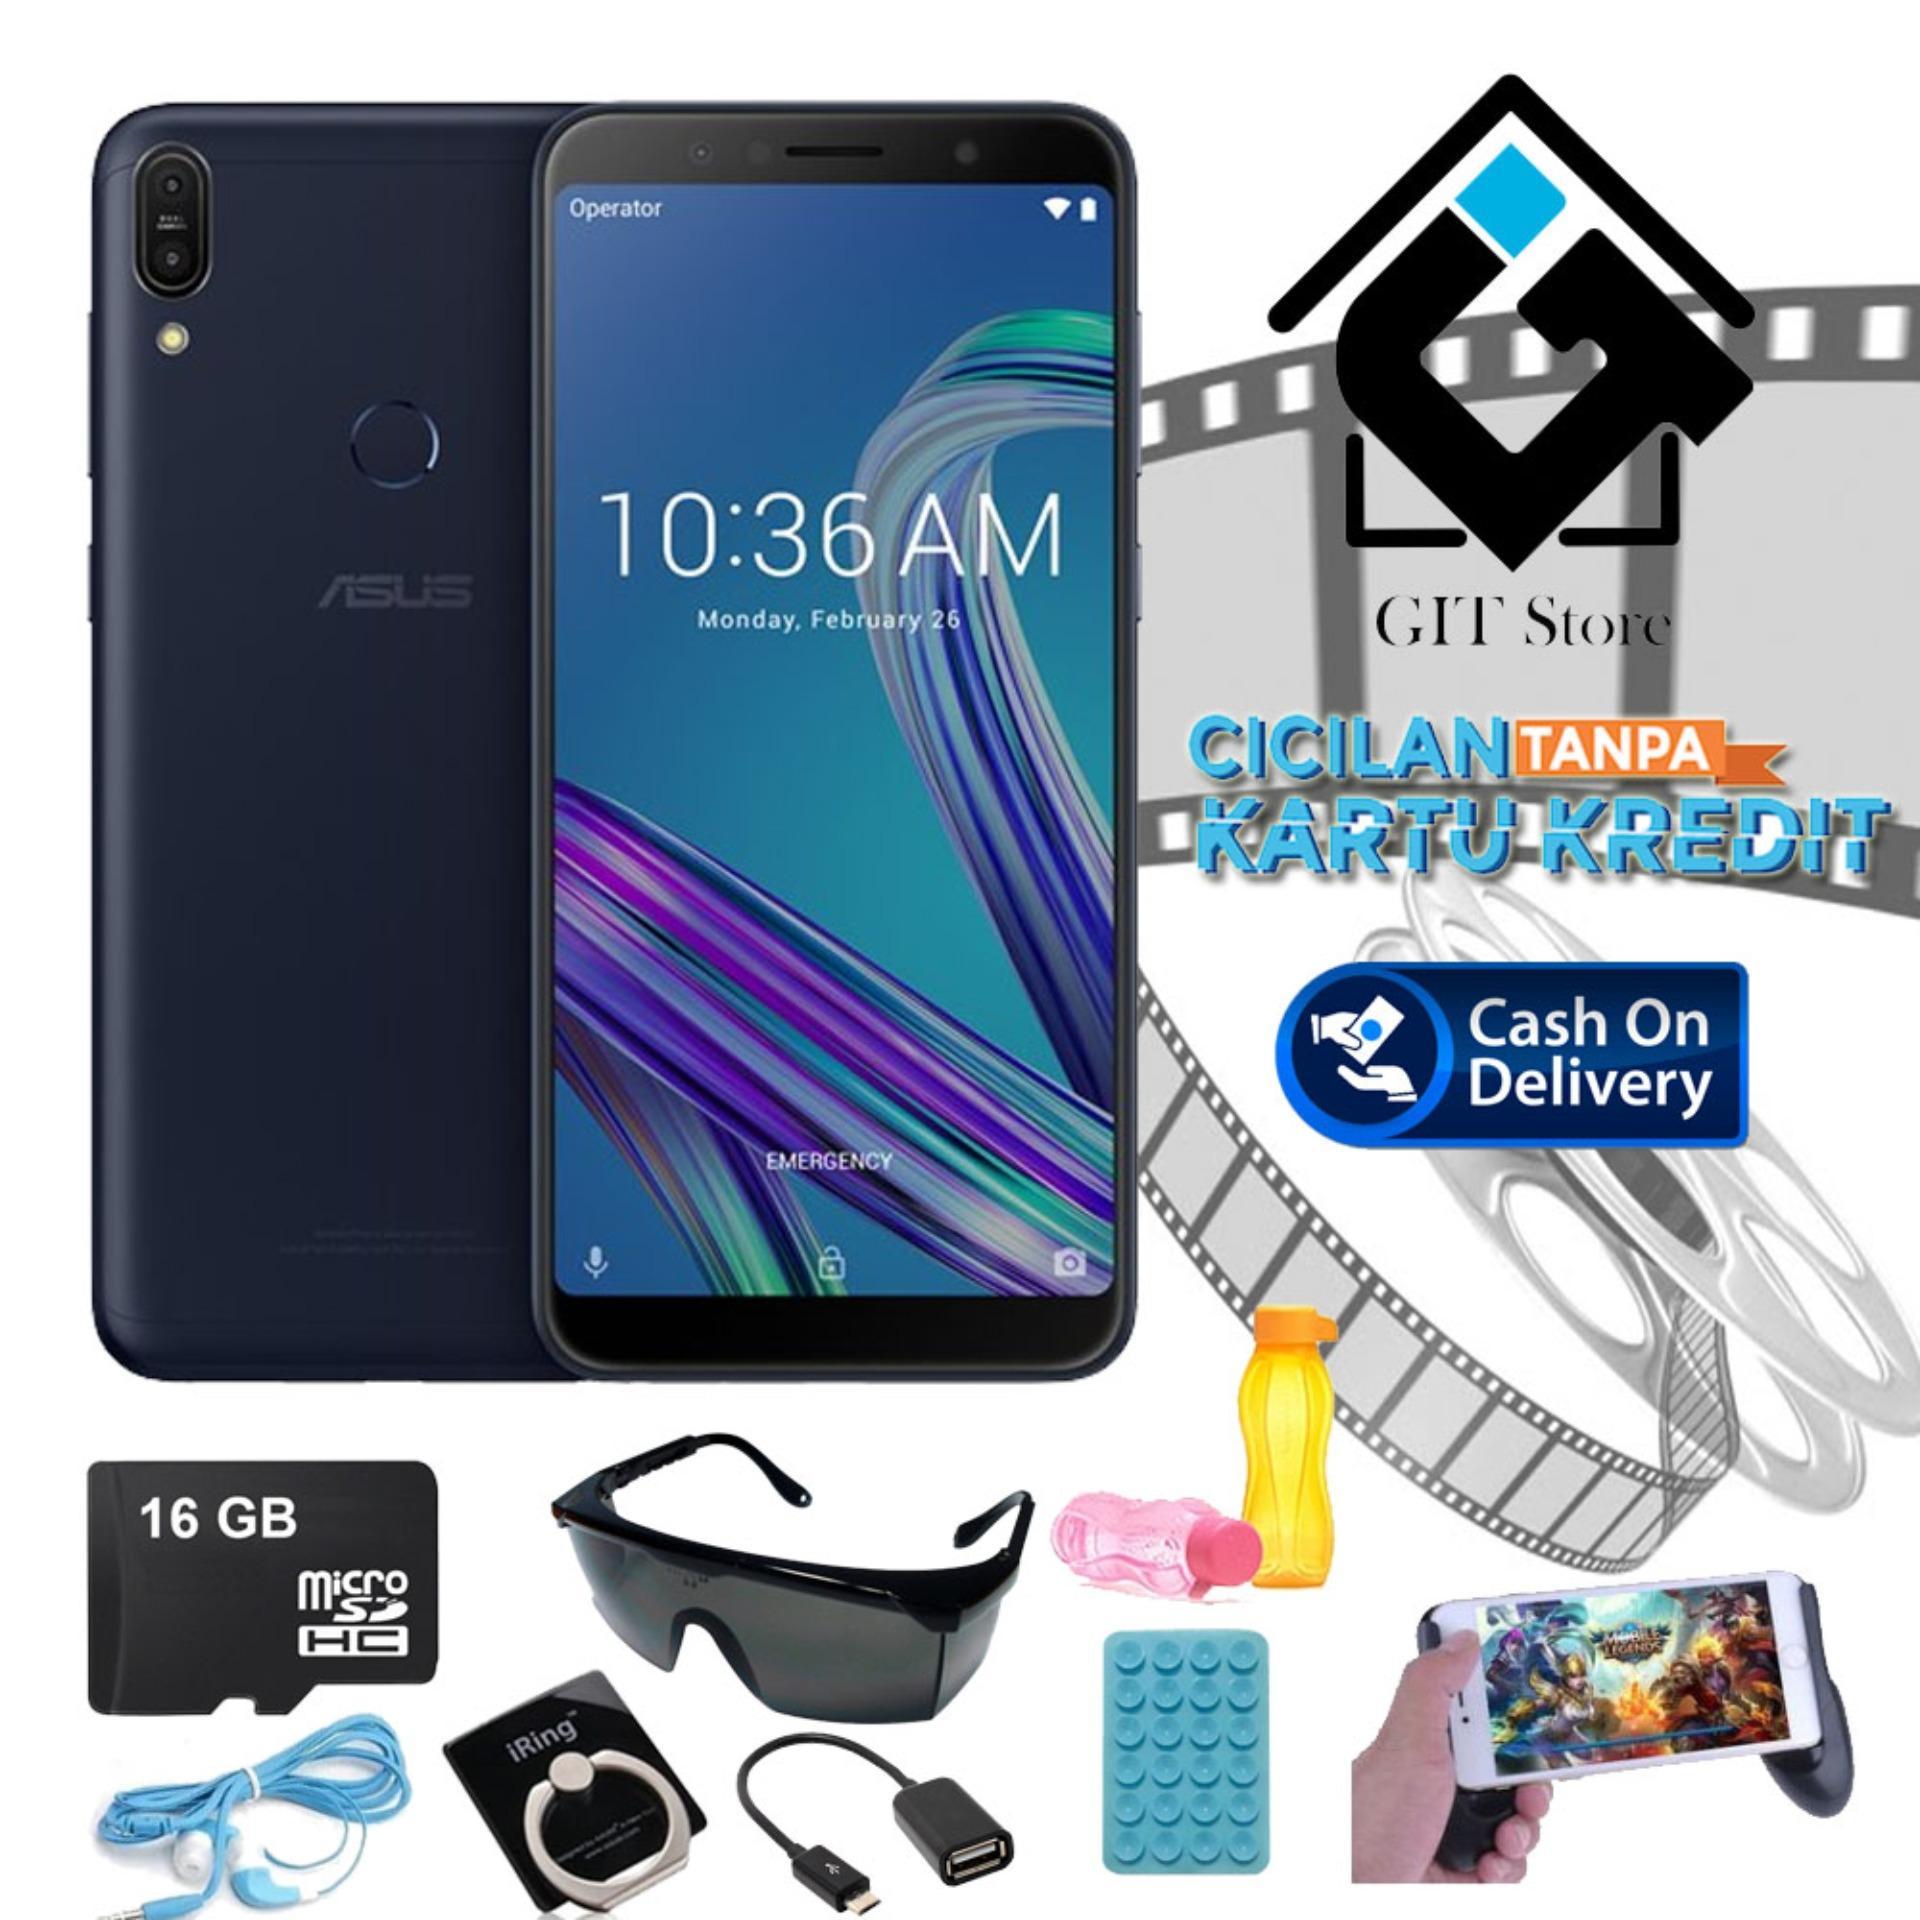 Asus Zenfone Max Pro (M1) ZB602KL 6GB / 64GB Paling Murah